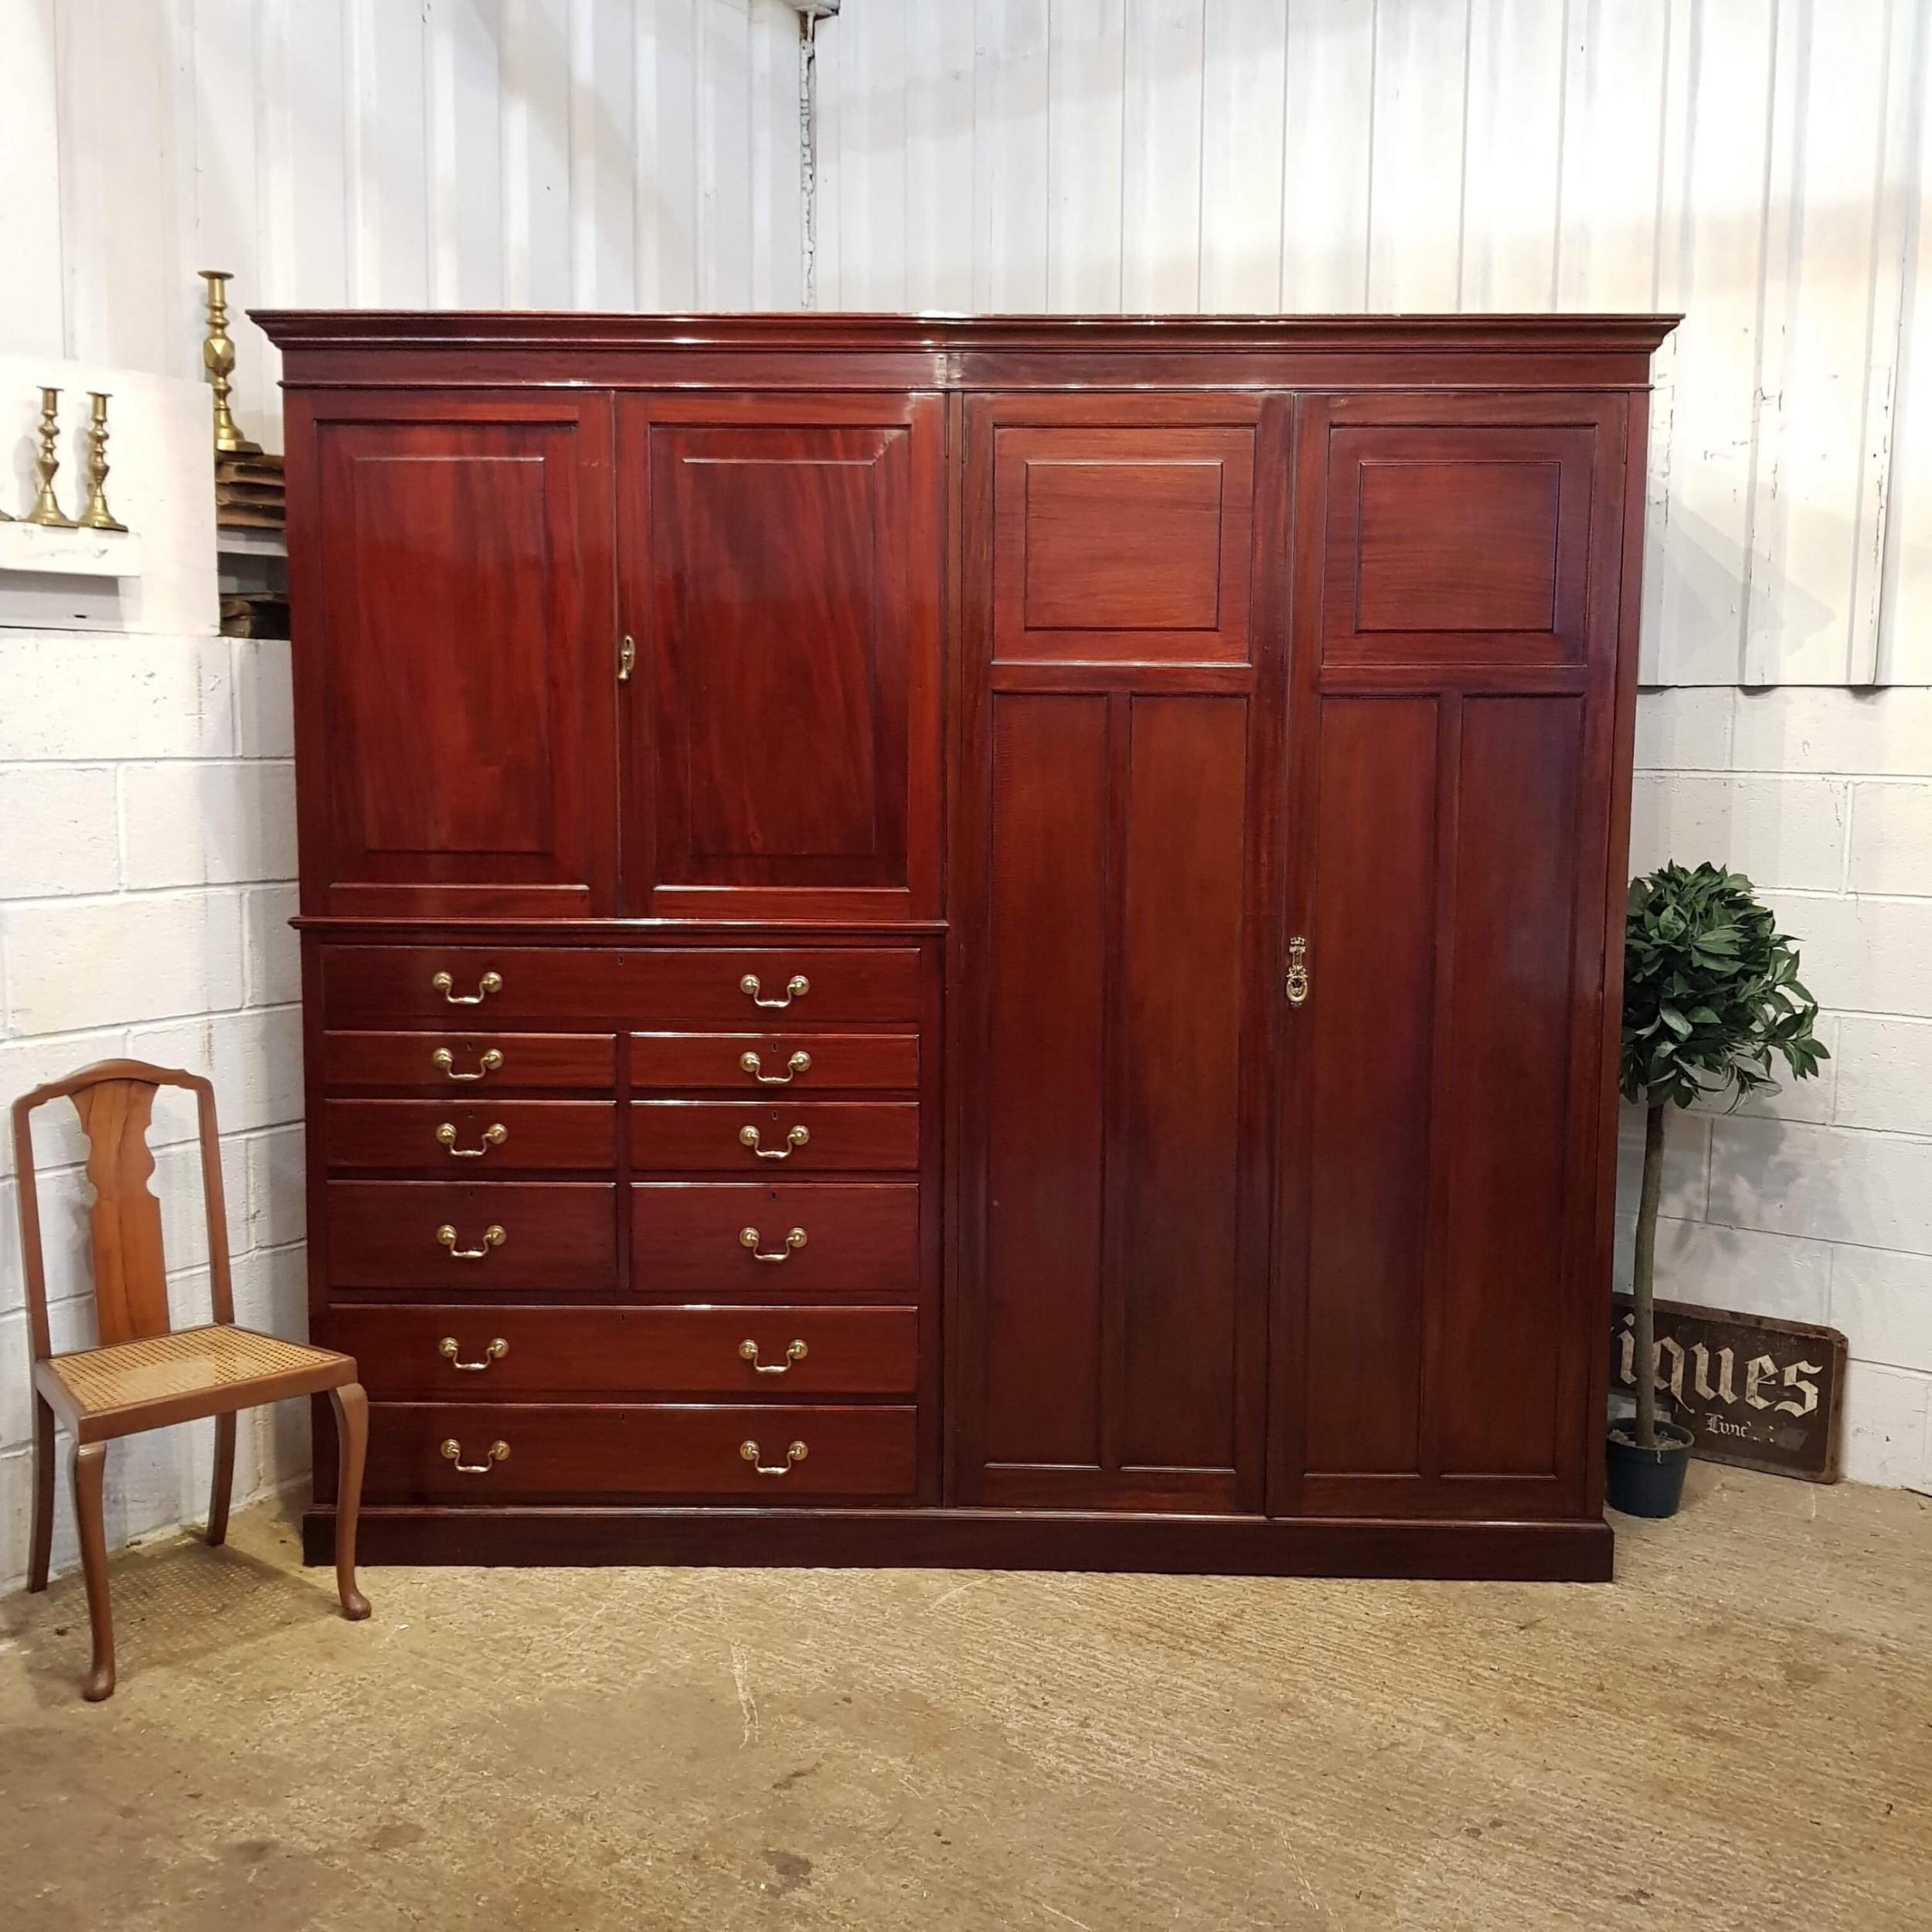 antique edwardian mahogany gents compactum wardrobe with clothes press c1900